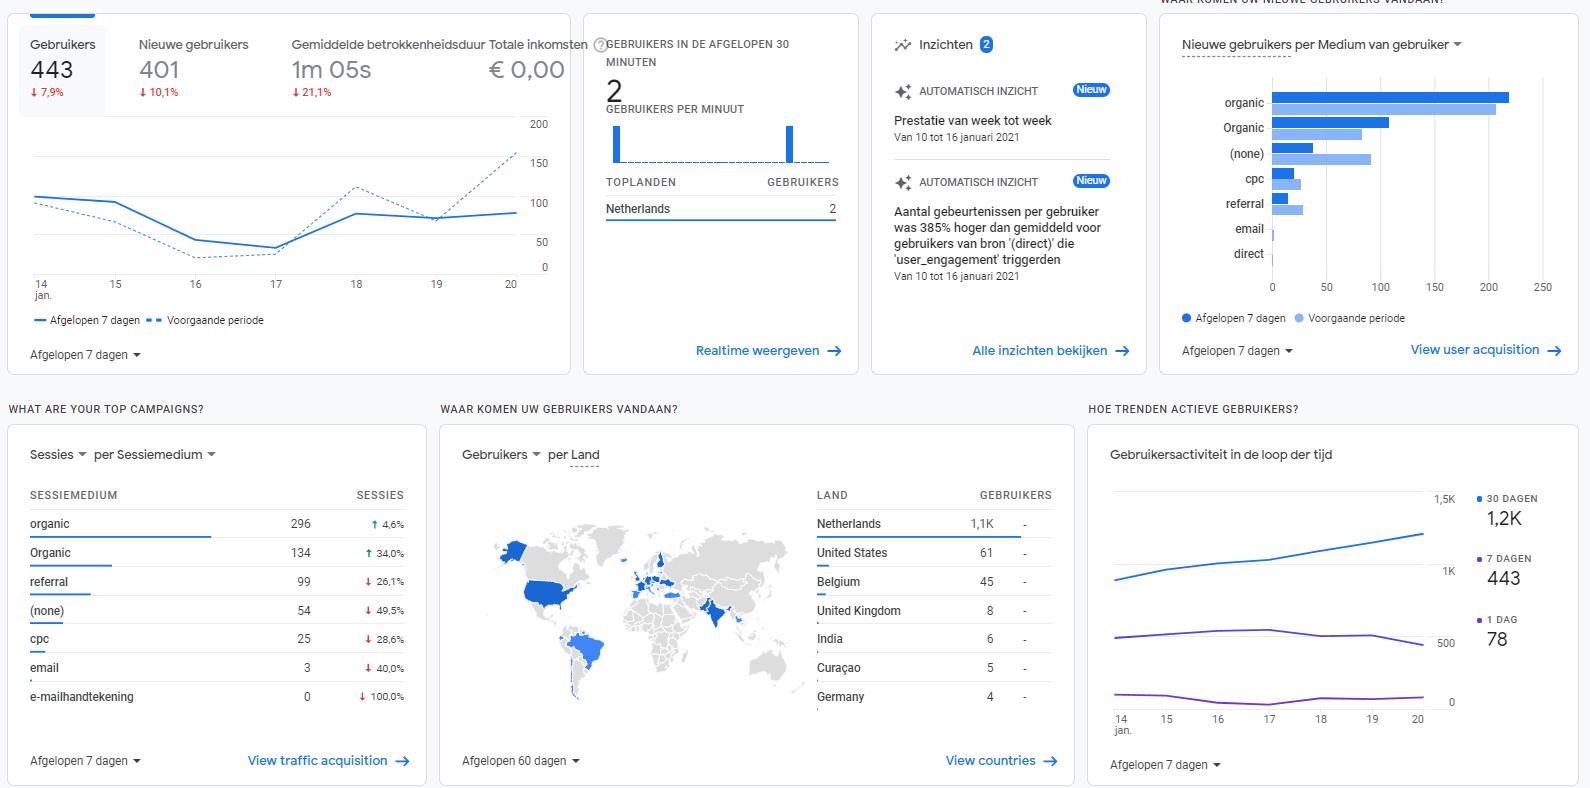 Afbeelding 4 Overzichtspagina Google Analytics 4